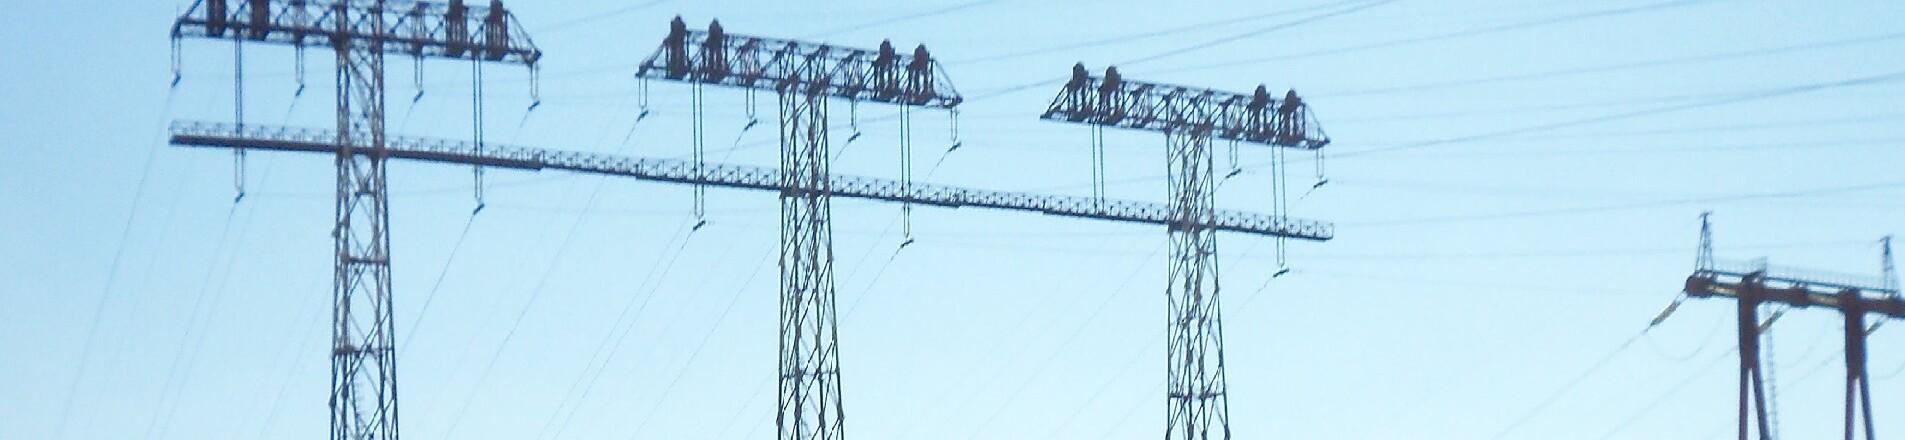 UK Power Networks hires 13 new graduates